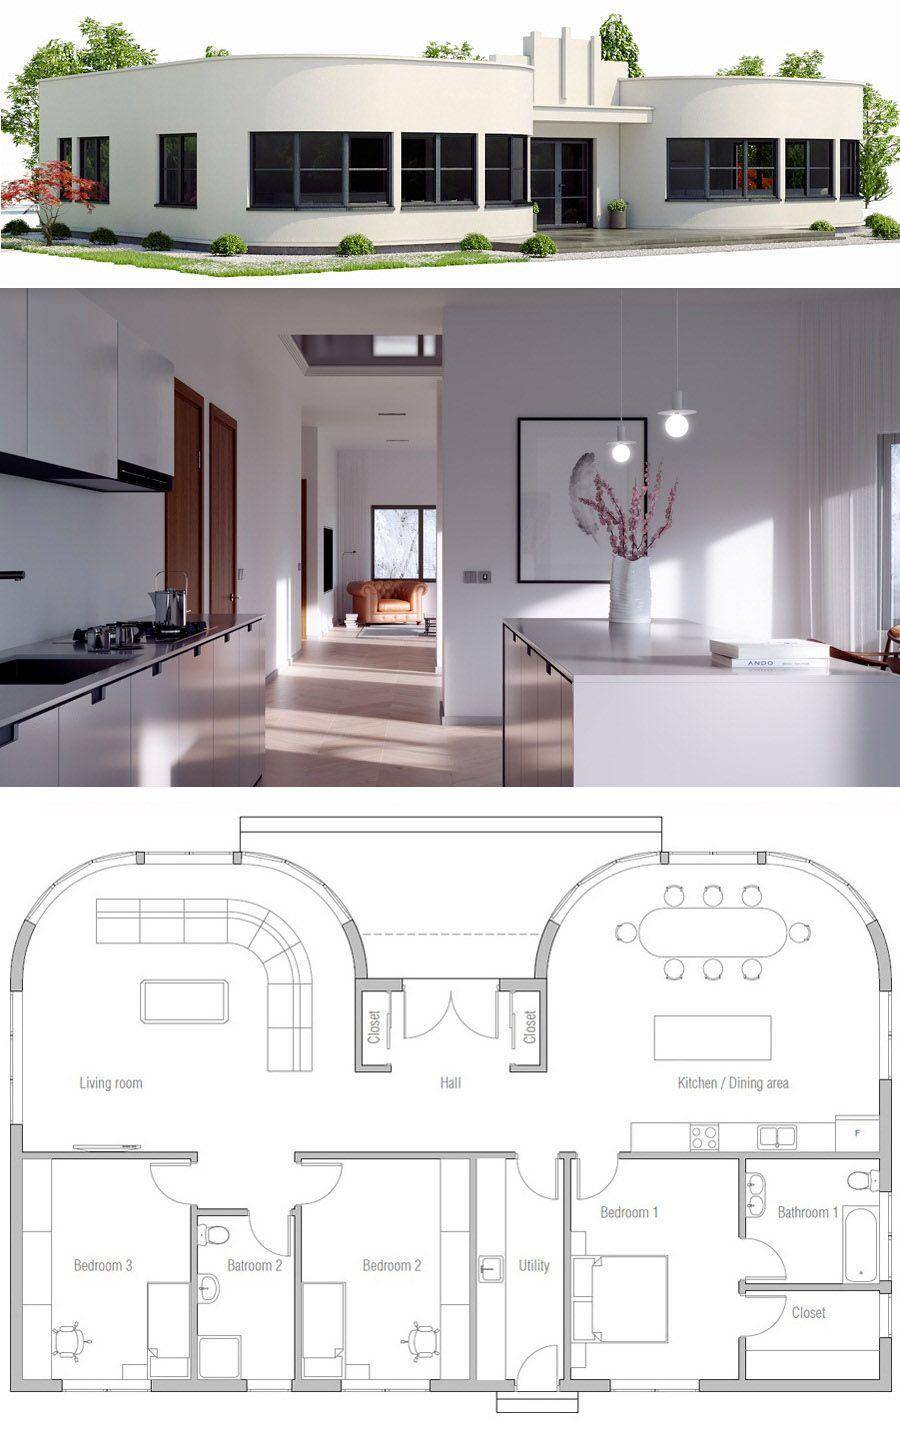 House Interior Designs Interiordesign Homeplans Floorplans